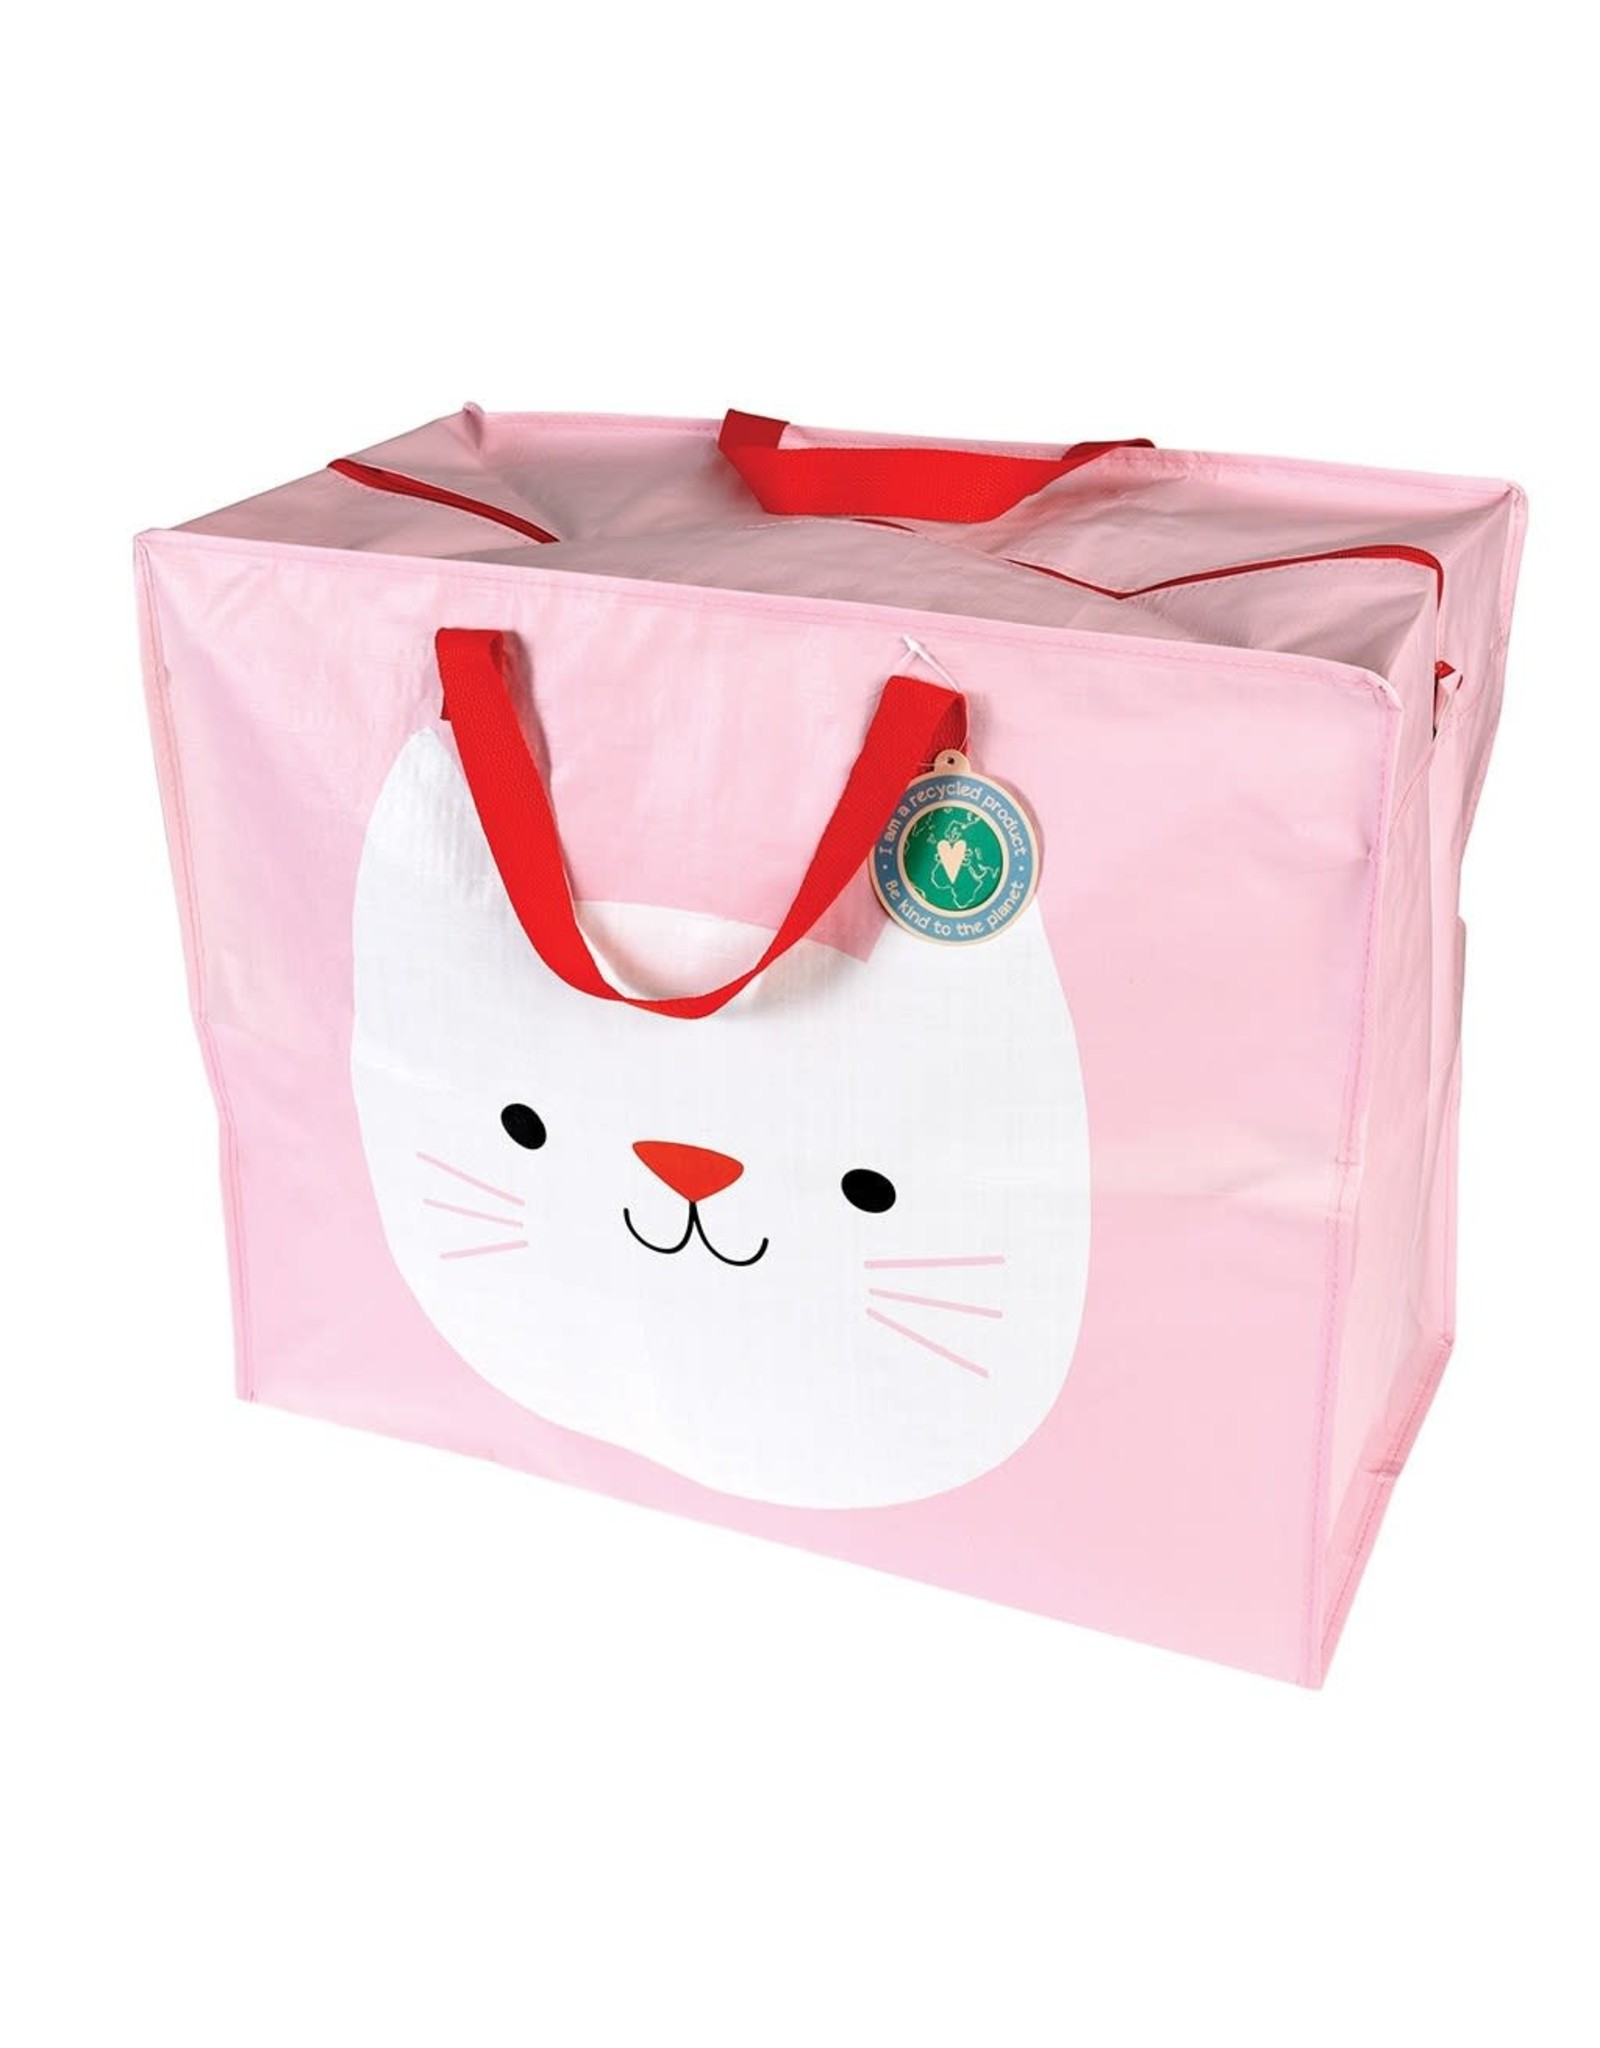 REX London Jumbo Storage Bag, Cookie the Cat